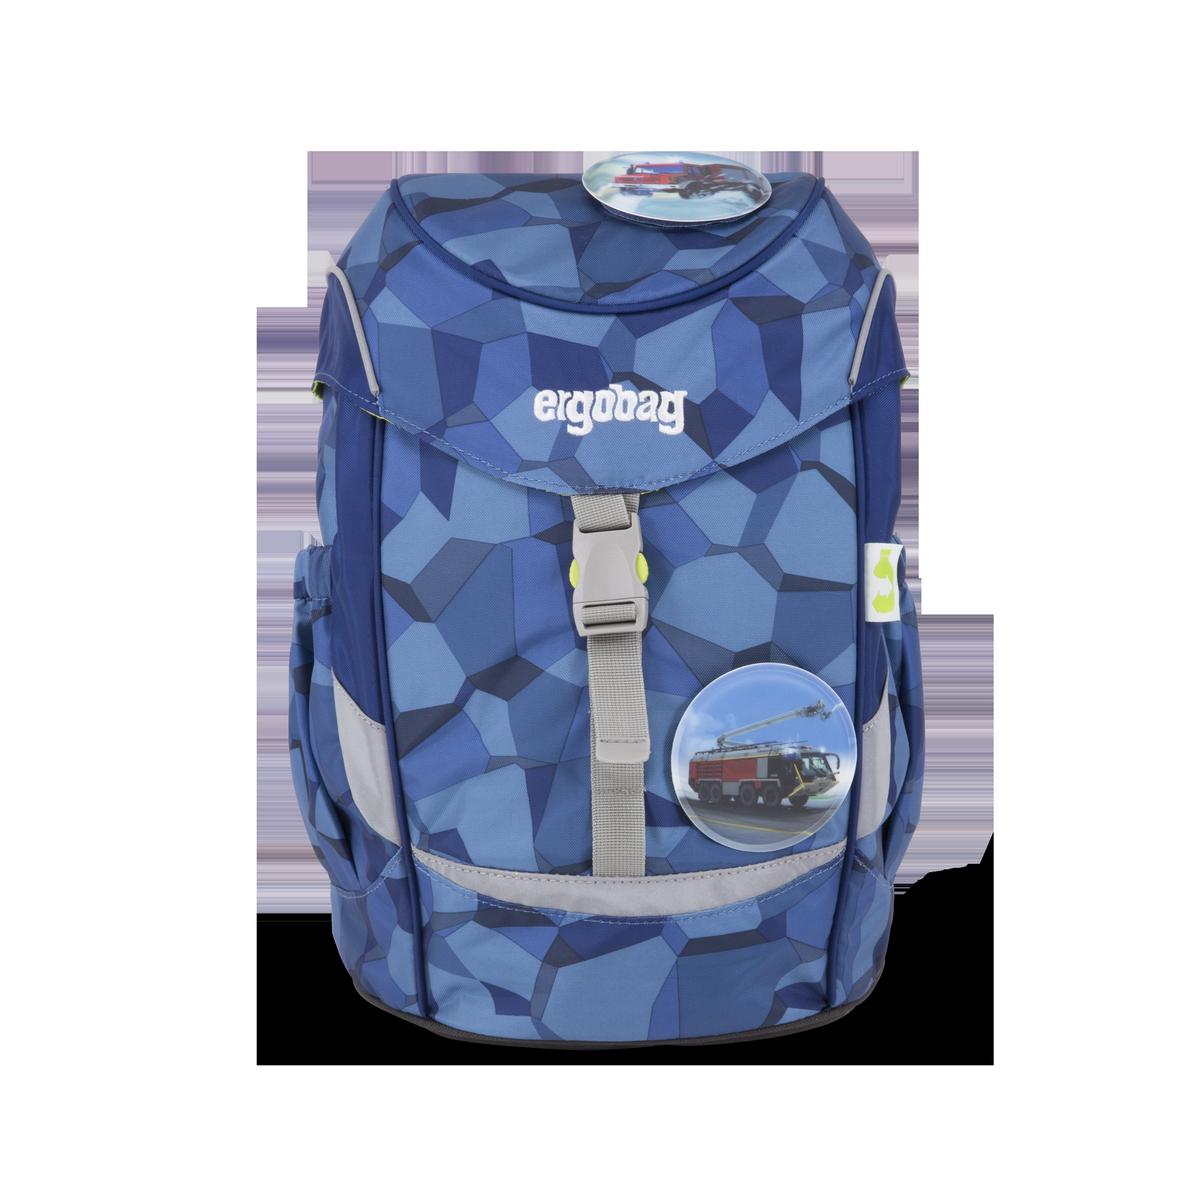 ERG-MIP-001-9K4-ergobag-mini-TatuetaBaer-01